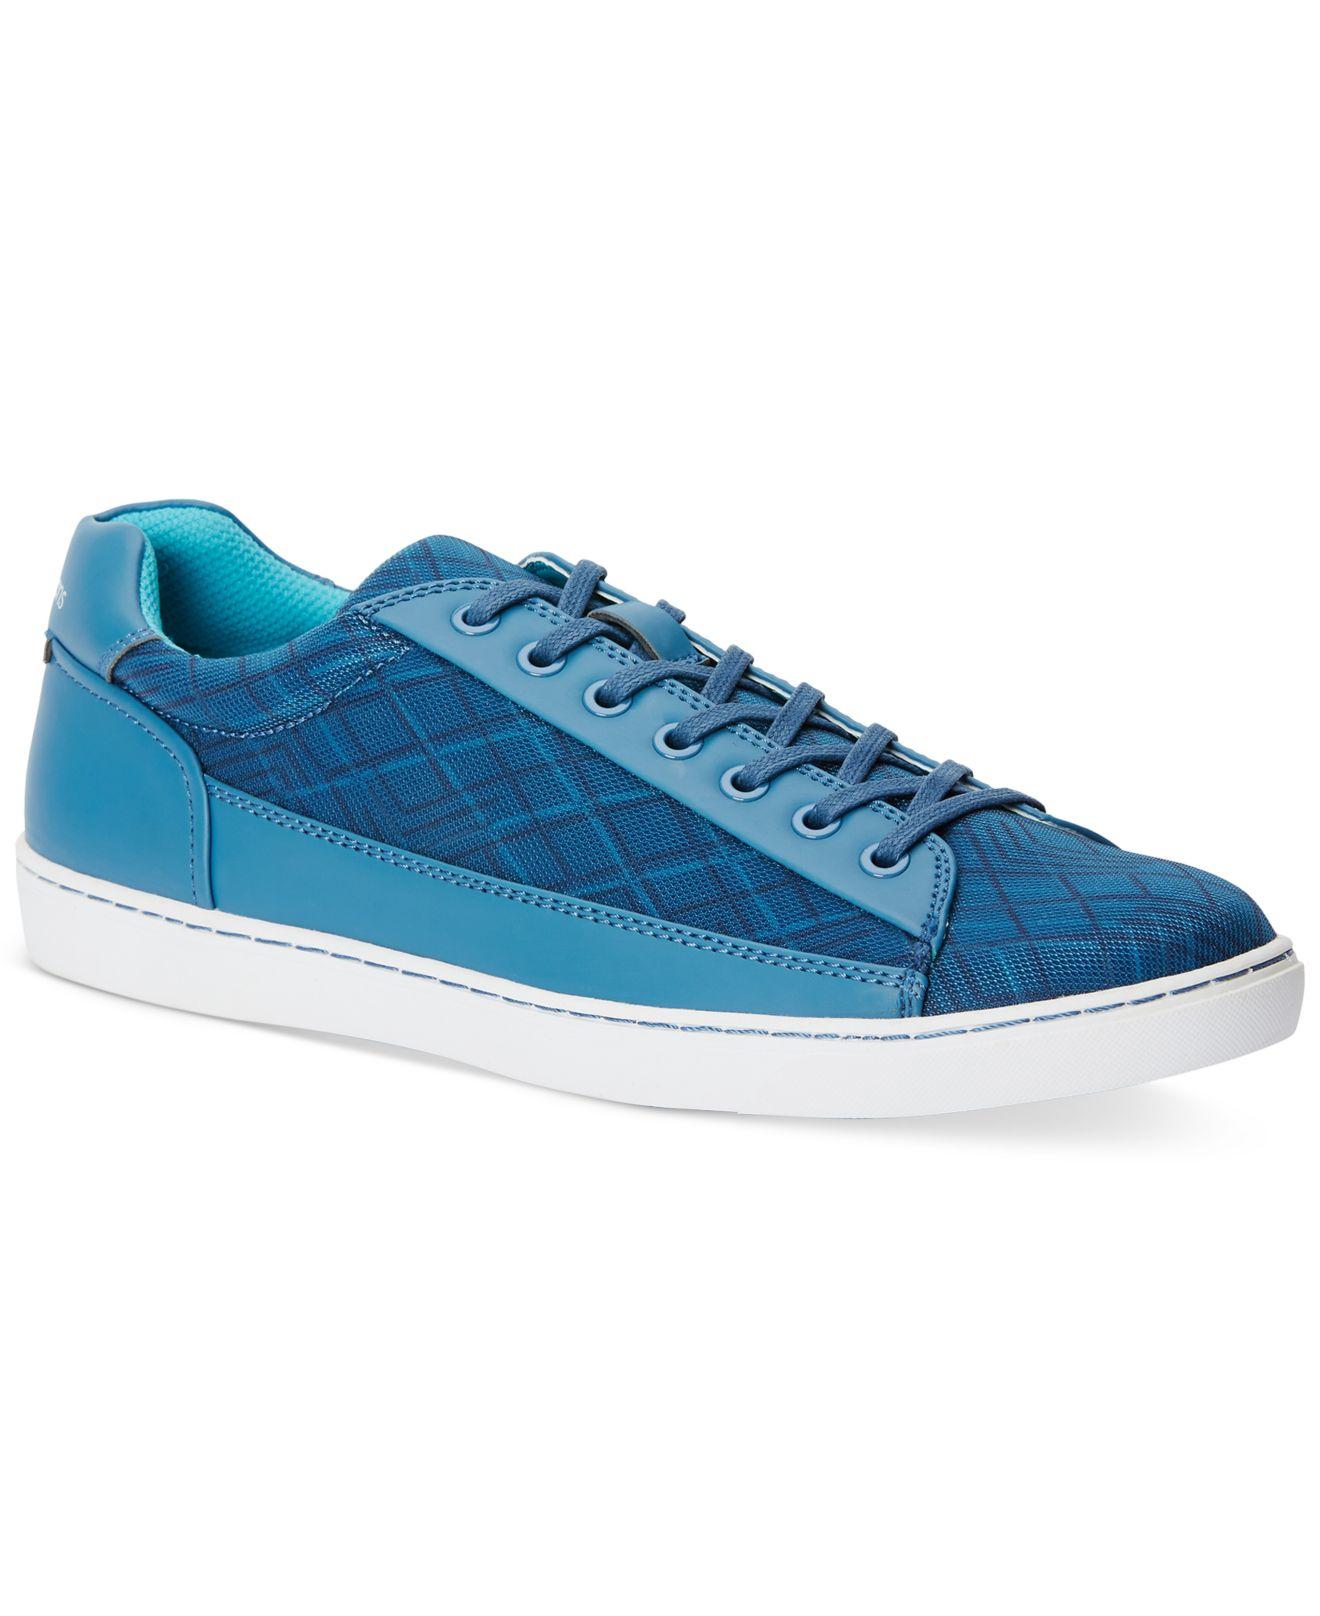 calvin klein jeans men 39 s zamir sneakers in blue for men lyst. Black Bedroom Furniture Sets. Home Design Ideas